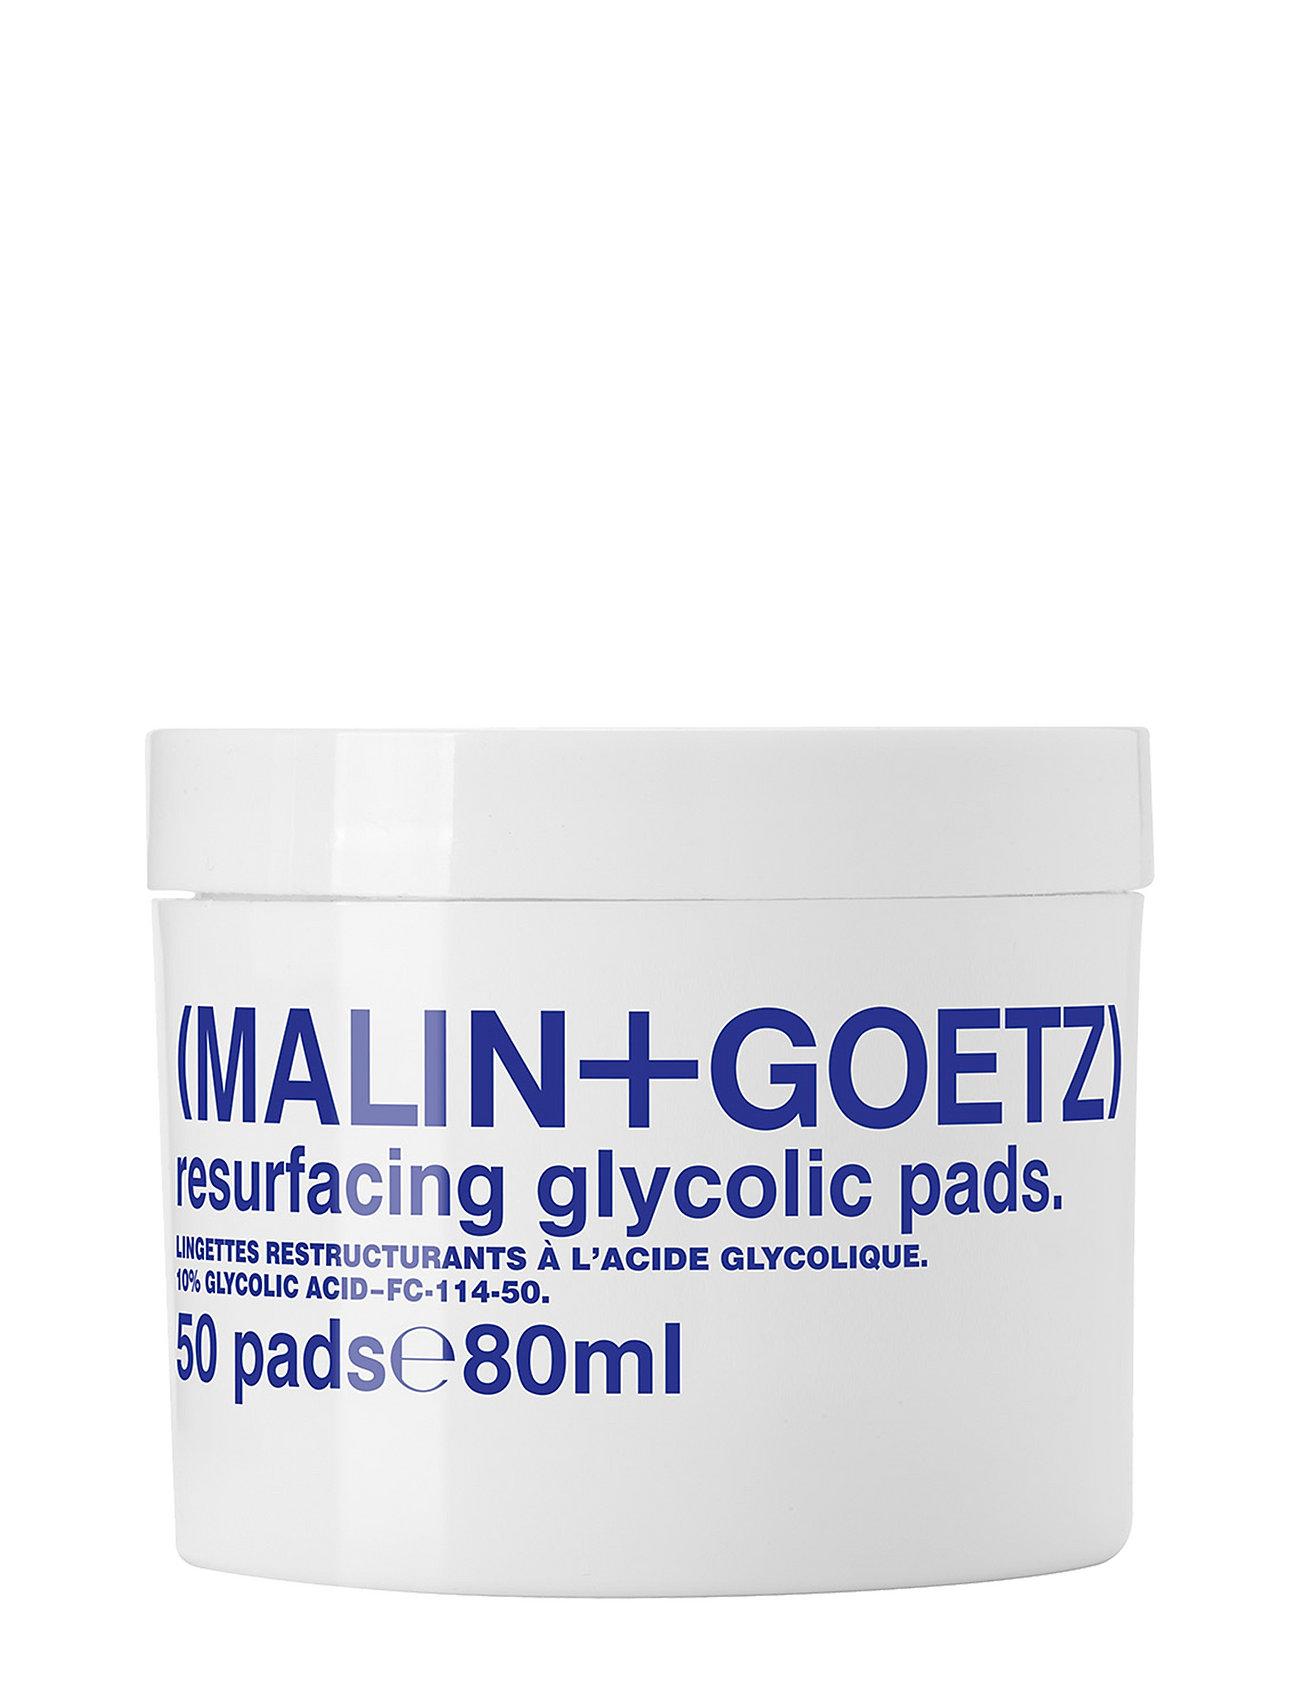 malin+goetz – Resurfacing glycolic pads fra boozt.com dk